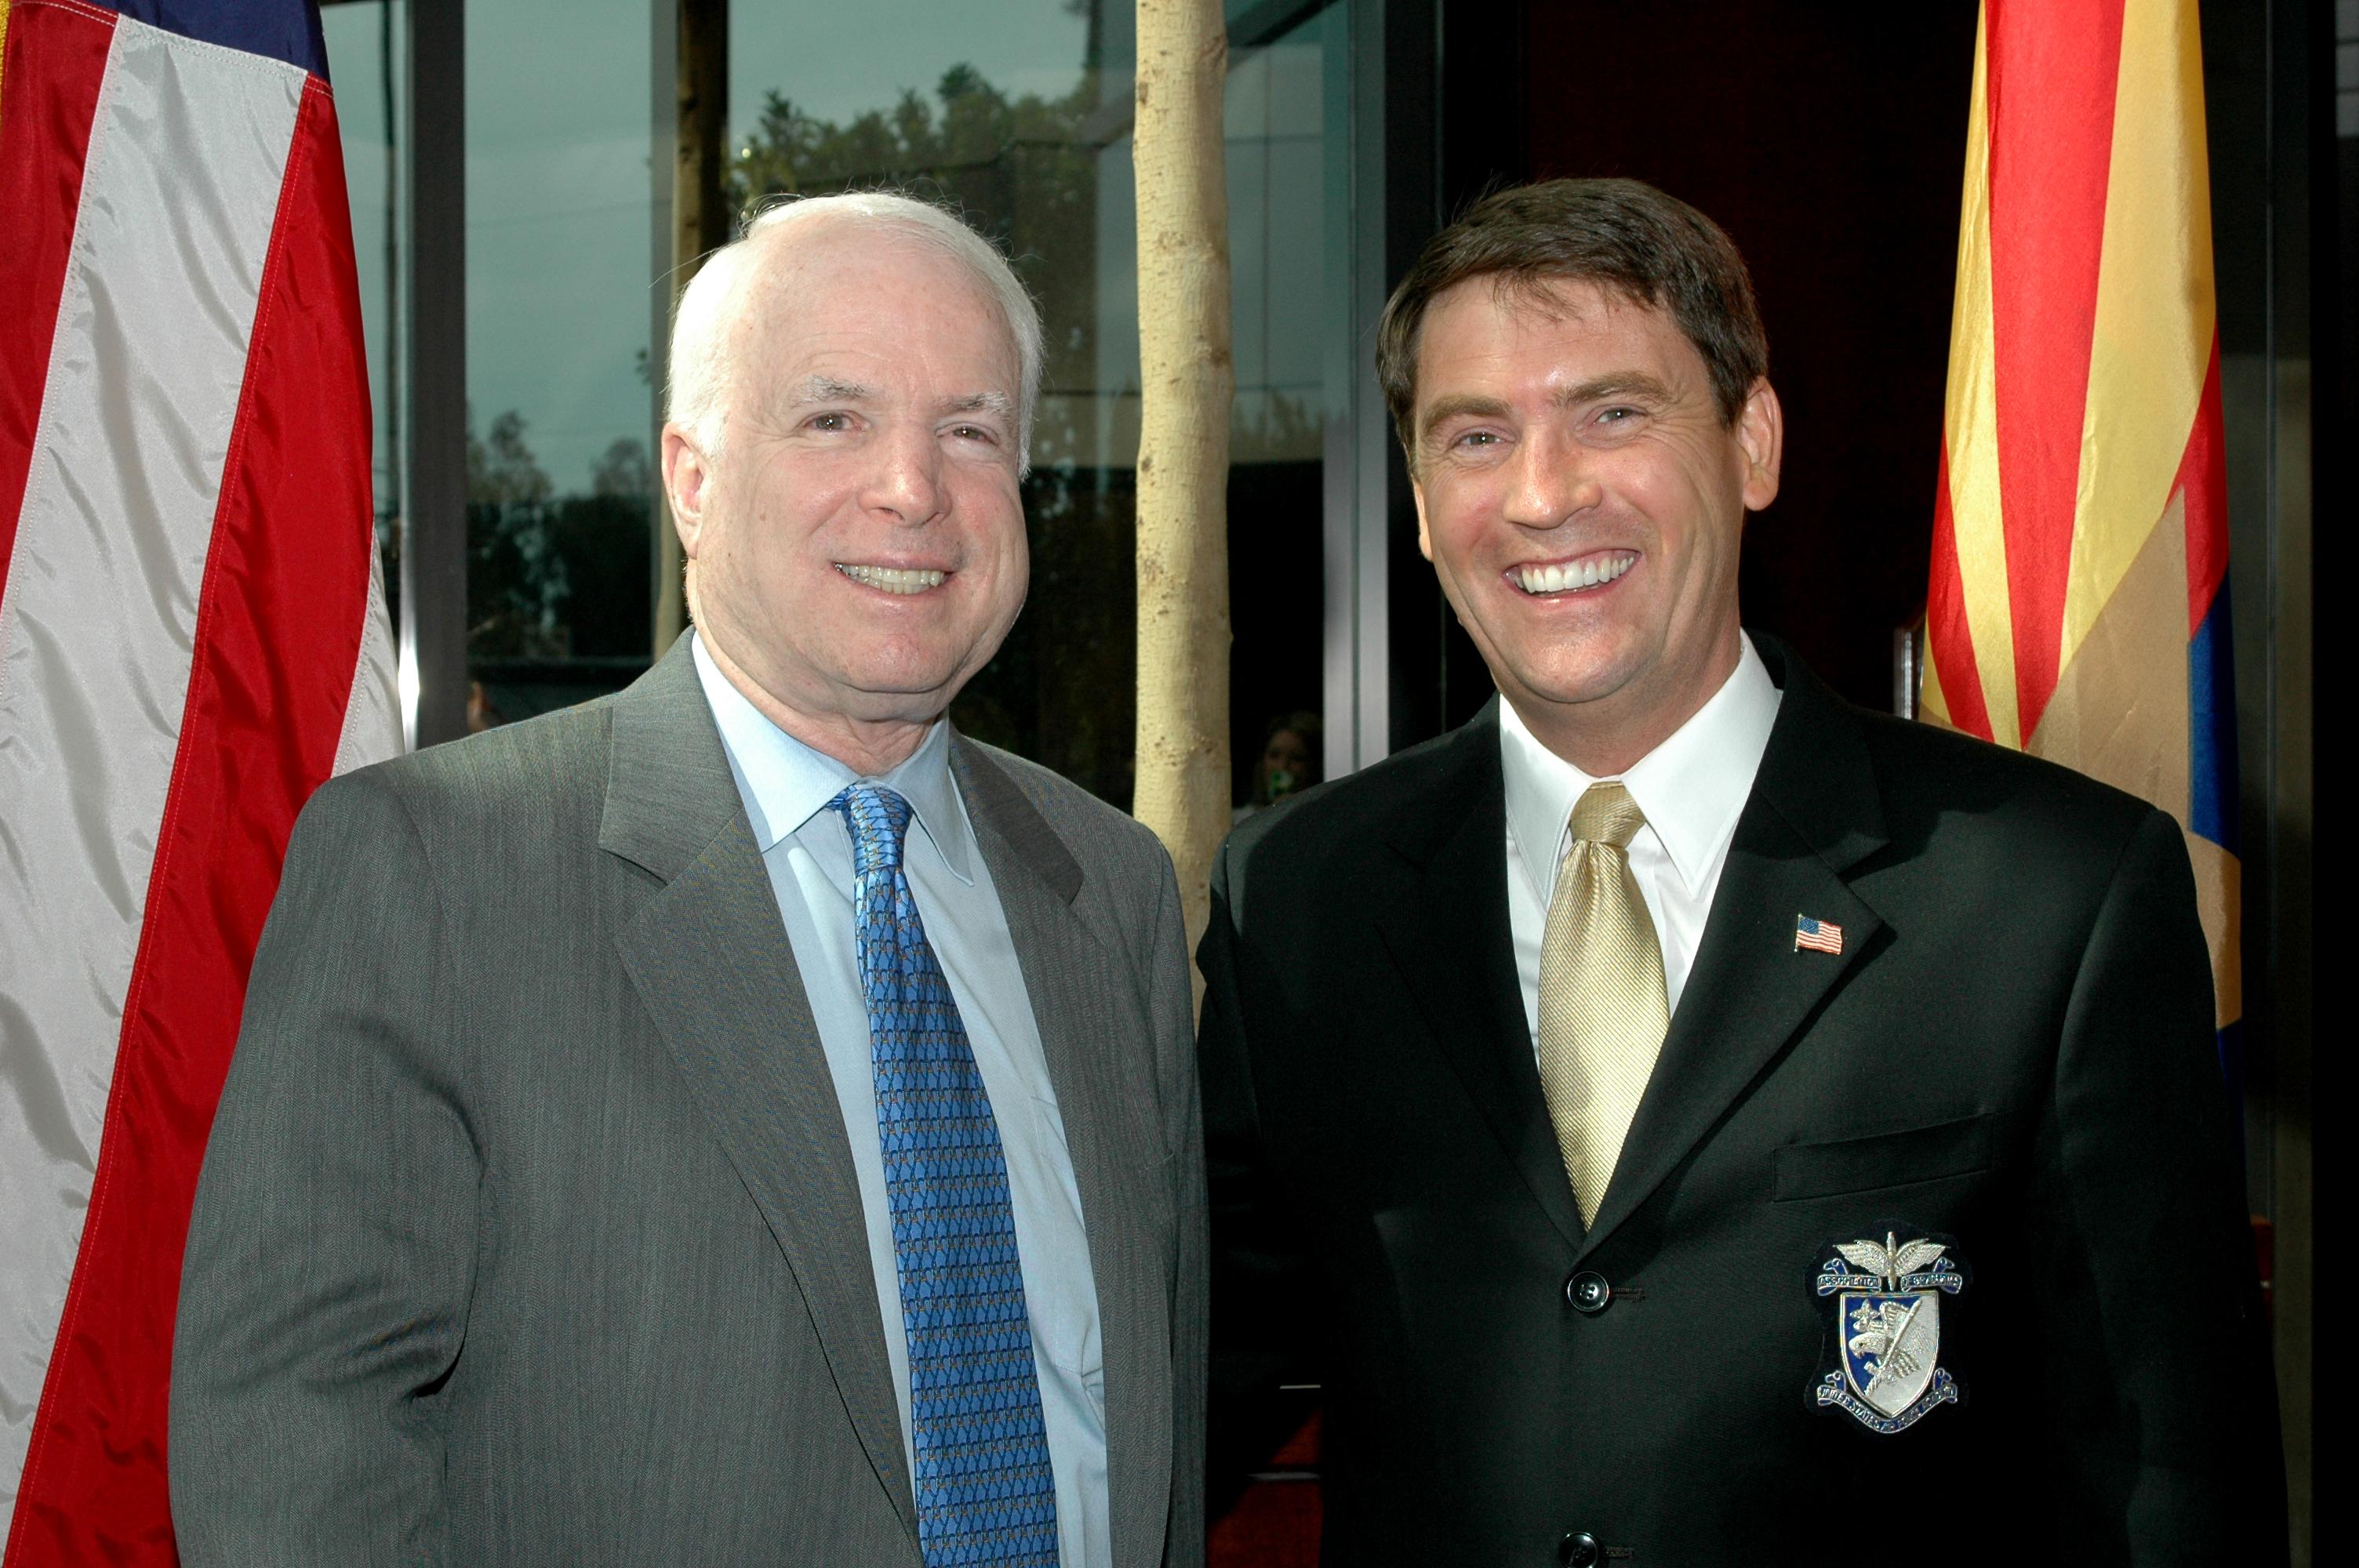 John_McCain_and_Frank_Schmuck.jpg